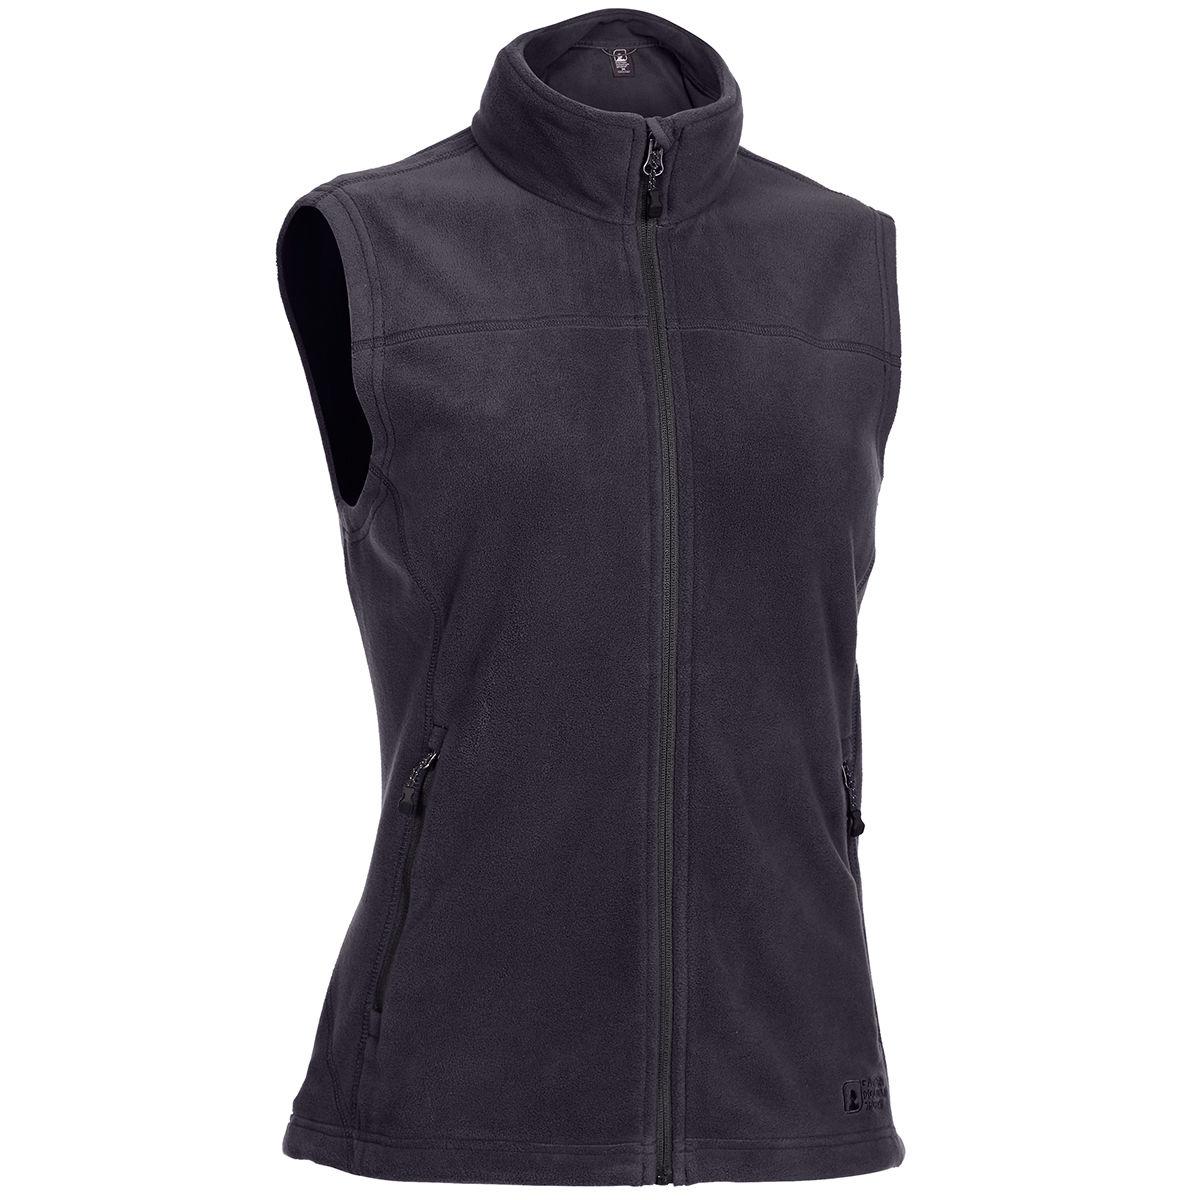 EMS Classic 200 Vest